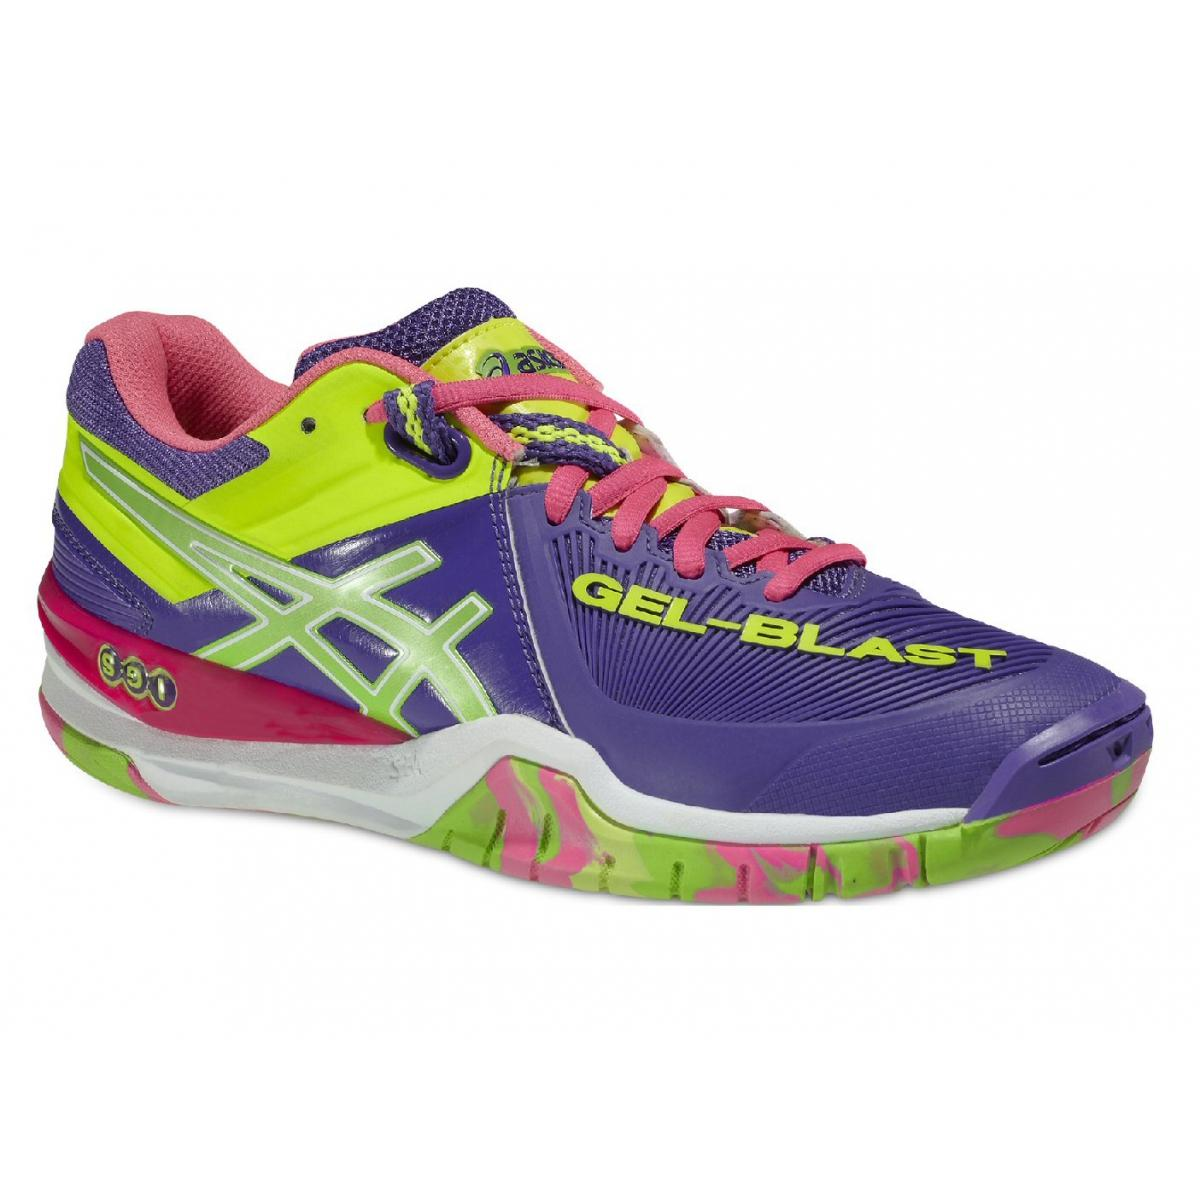 Asics Gel Blast 6 multi colour women\u0027s handball indoor court shoe trainers  E463Y